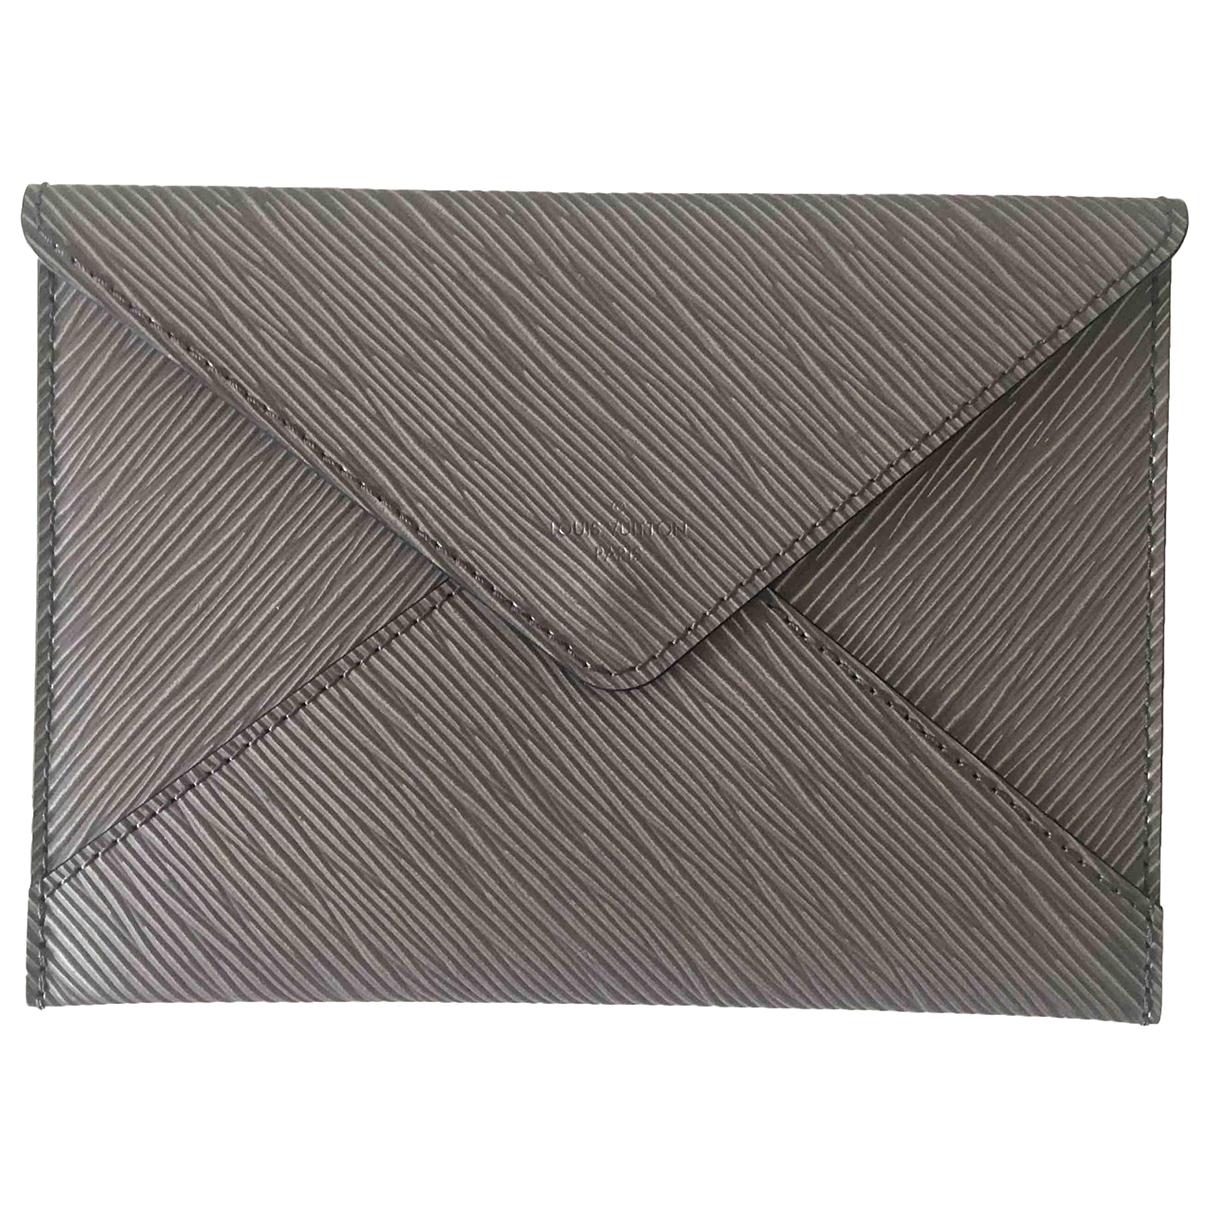 Louis Vuitton \N Silver Leather Clutch bag for Women \N